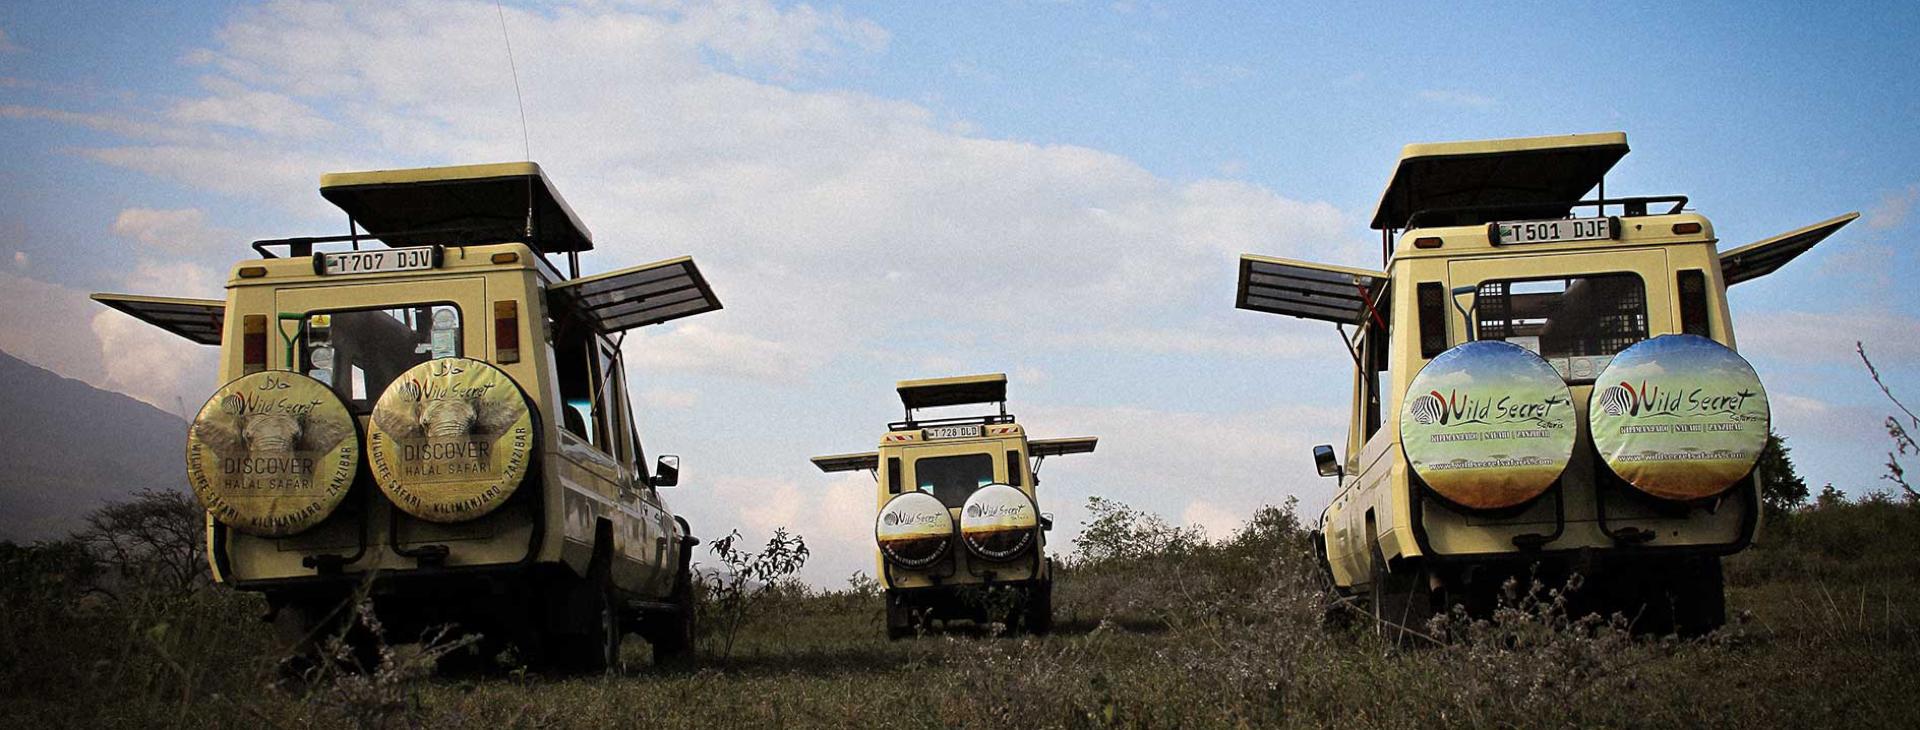 Our safari Vehicle tanzania